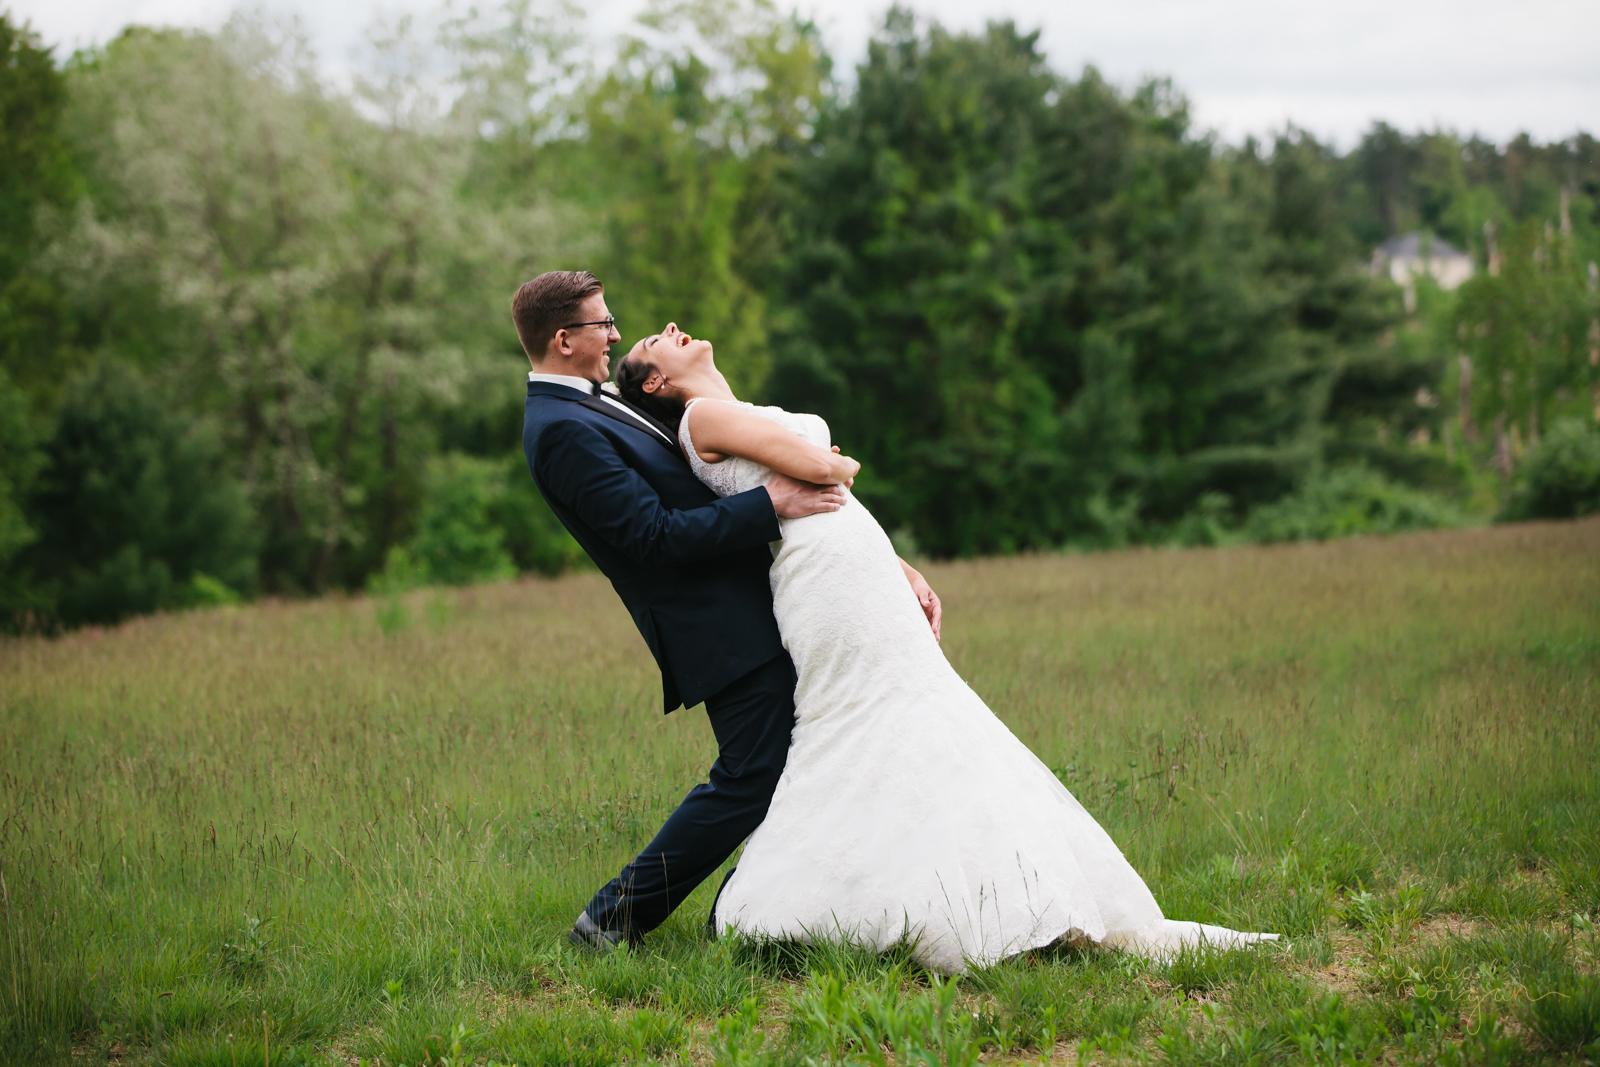 Publick-House-Wedding-Amanda-Morgan-20.jpg